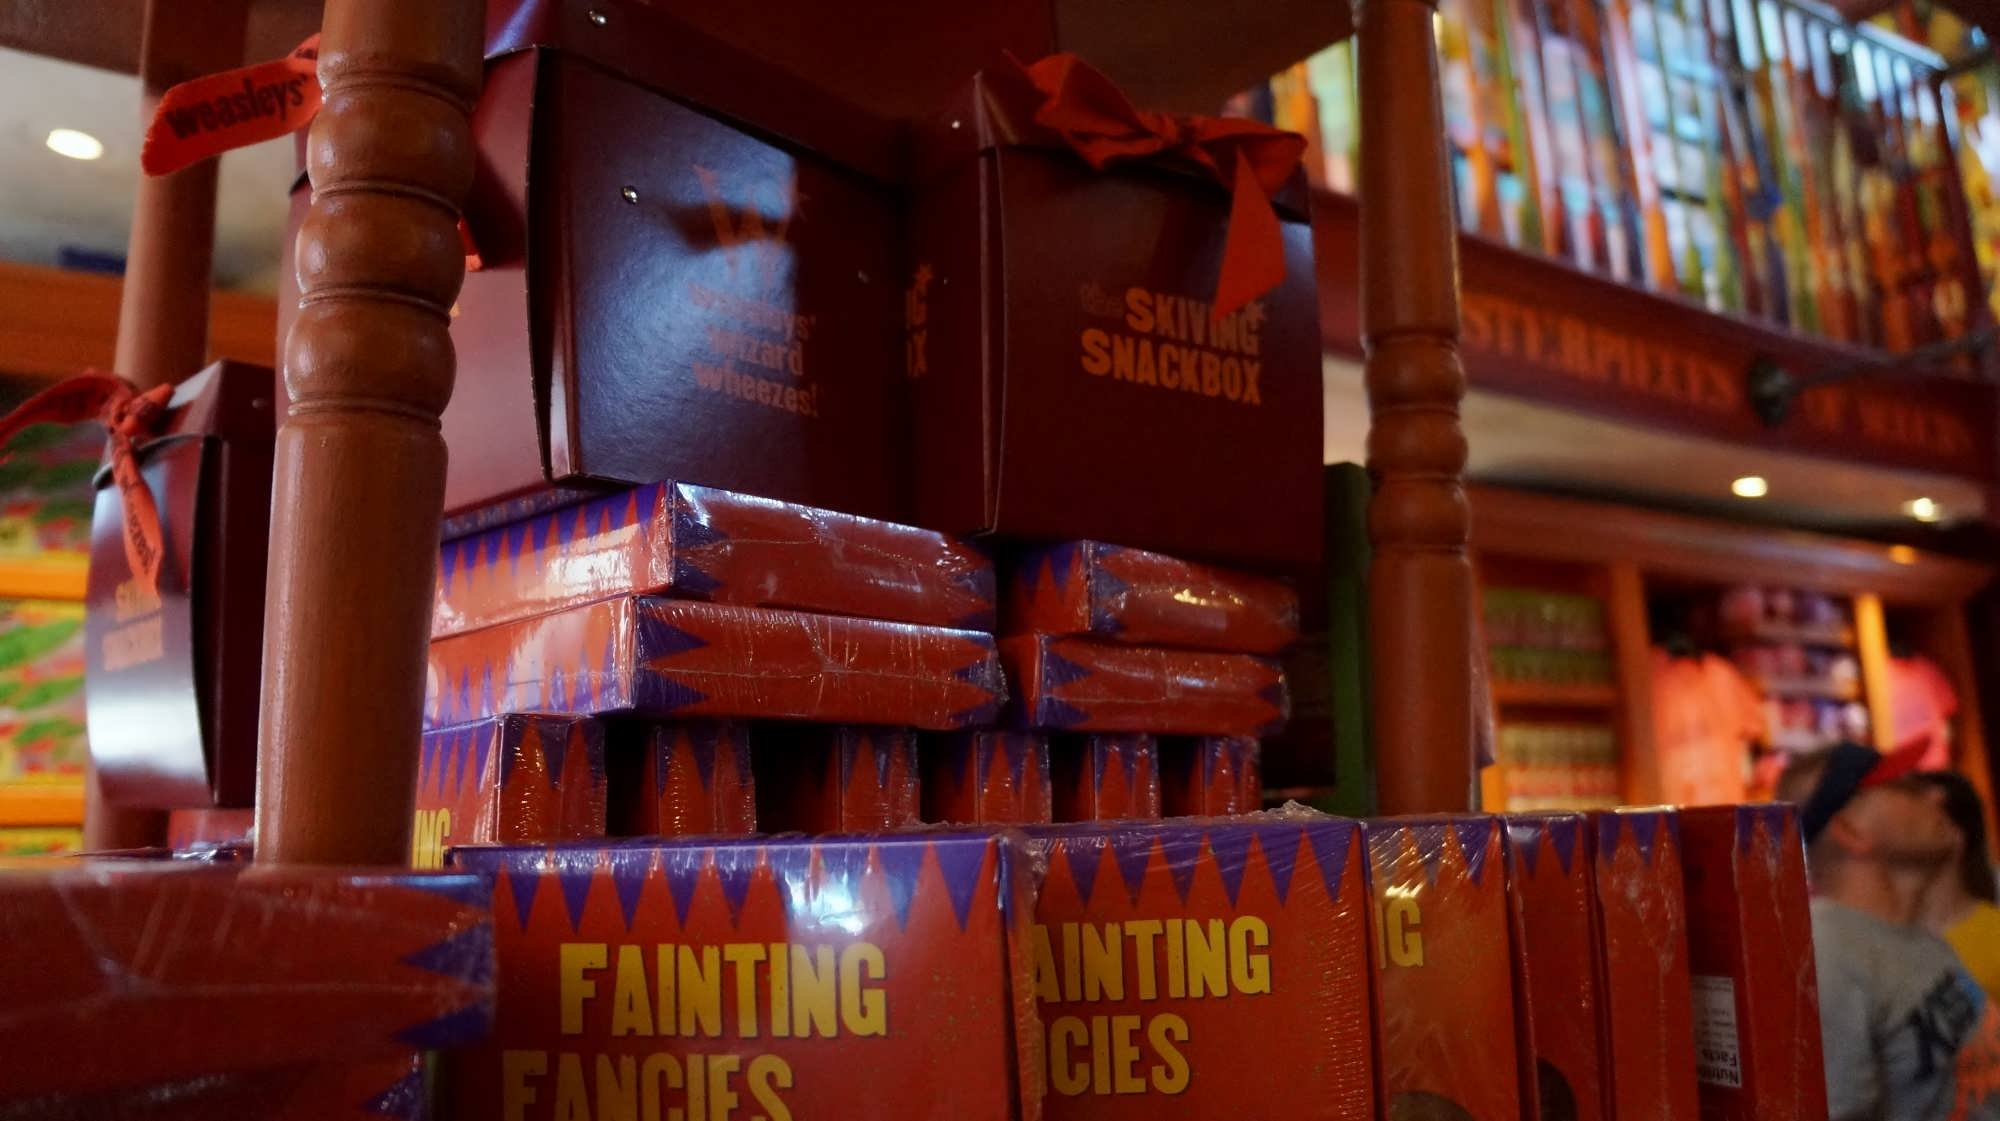 The Skiving Snackbox at Weasleys' Wizard Wheezes